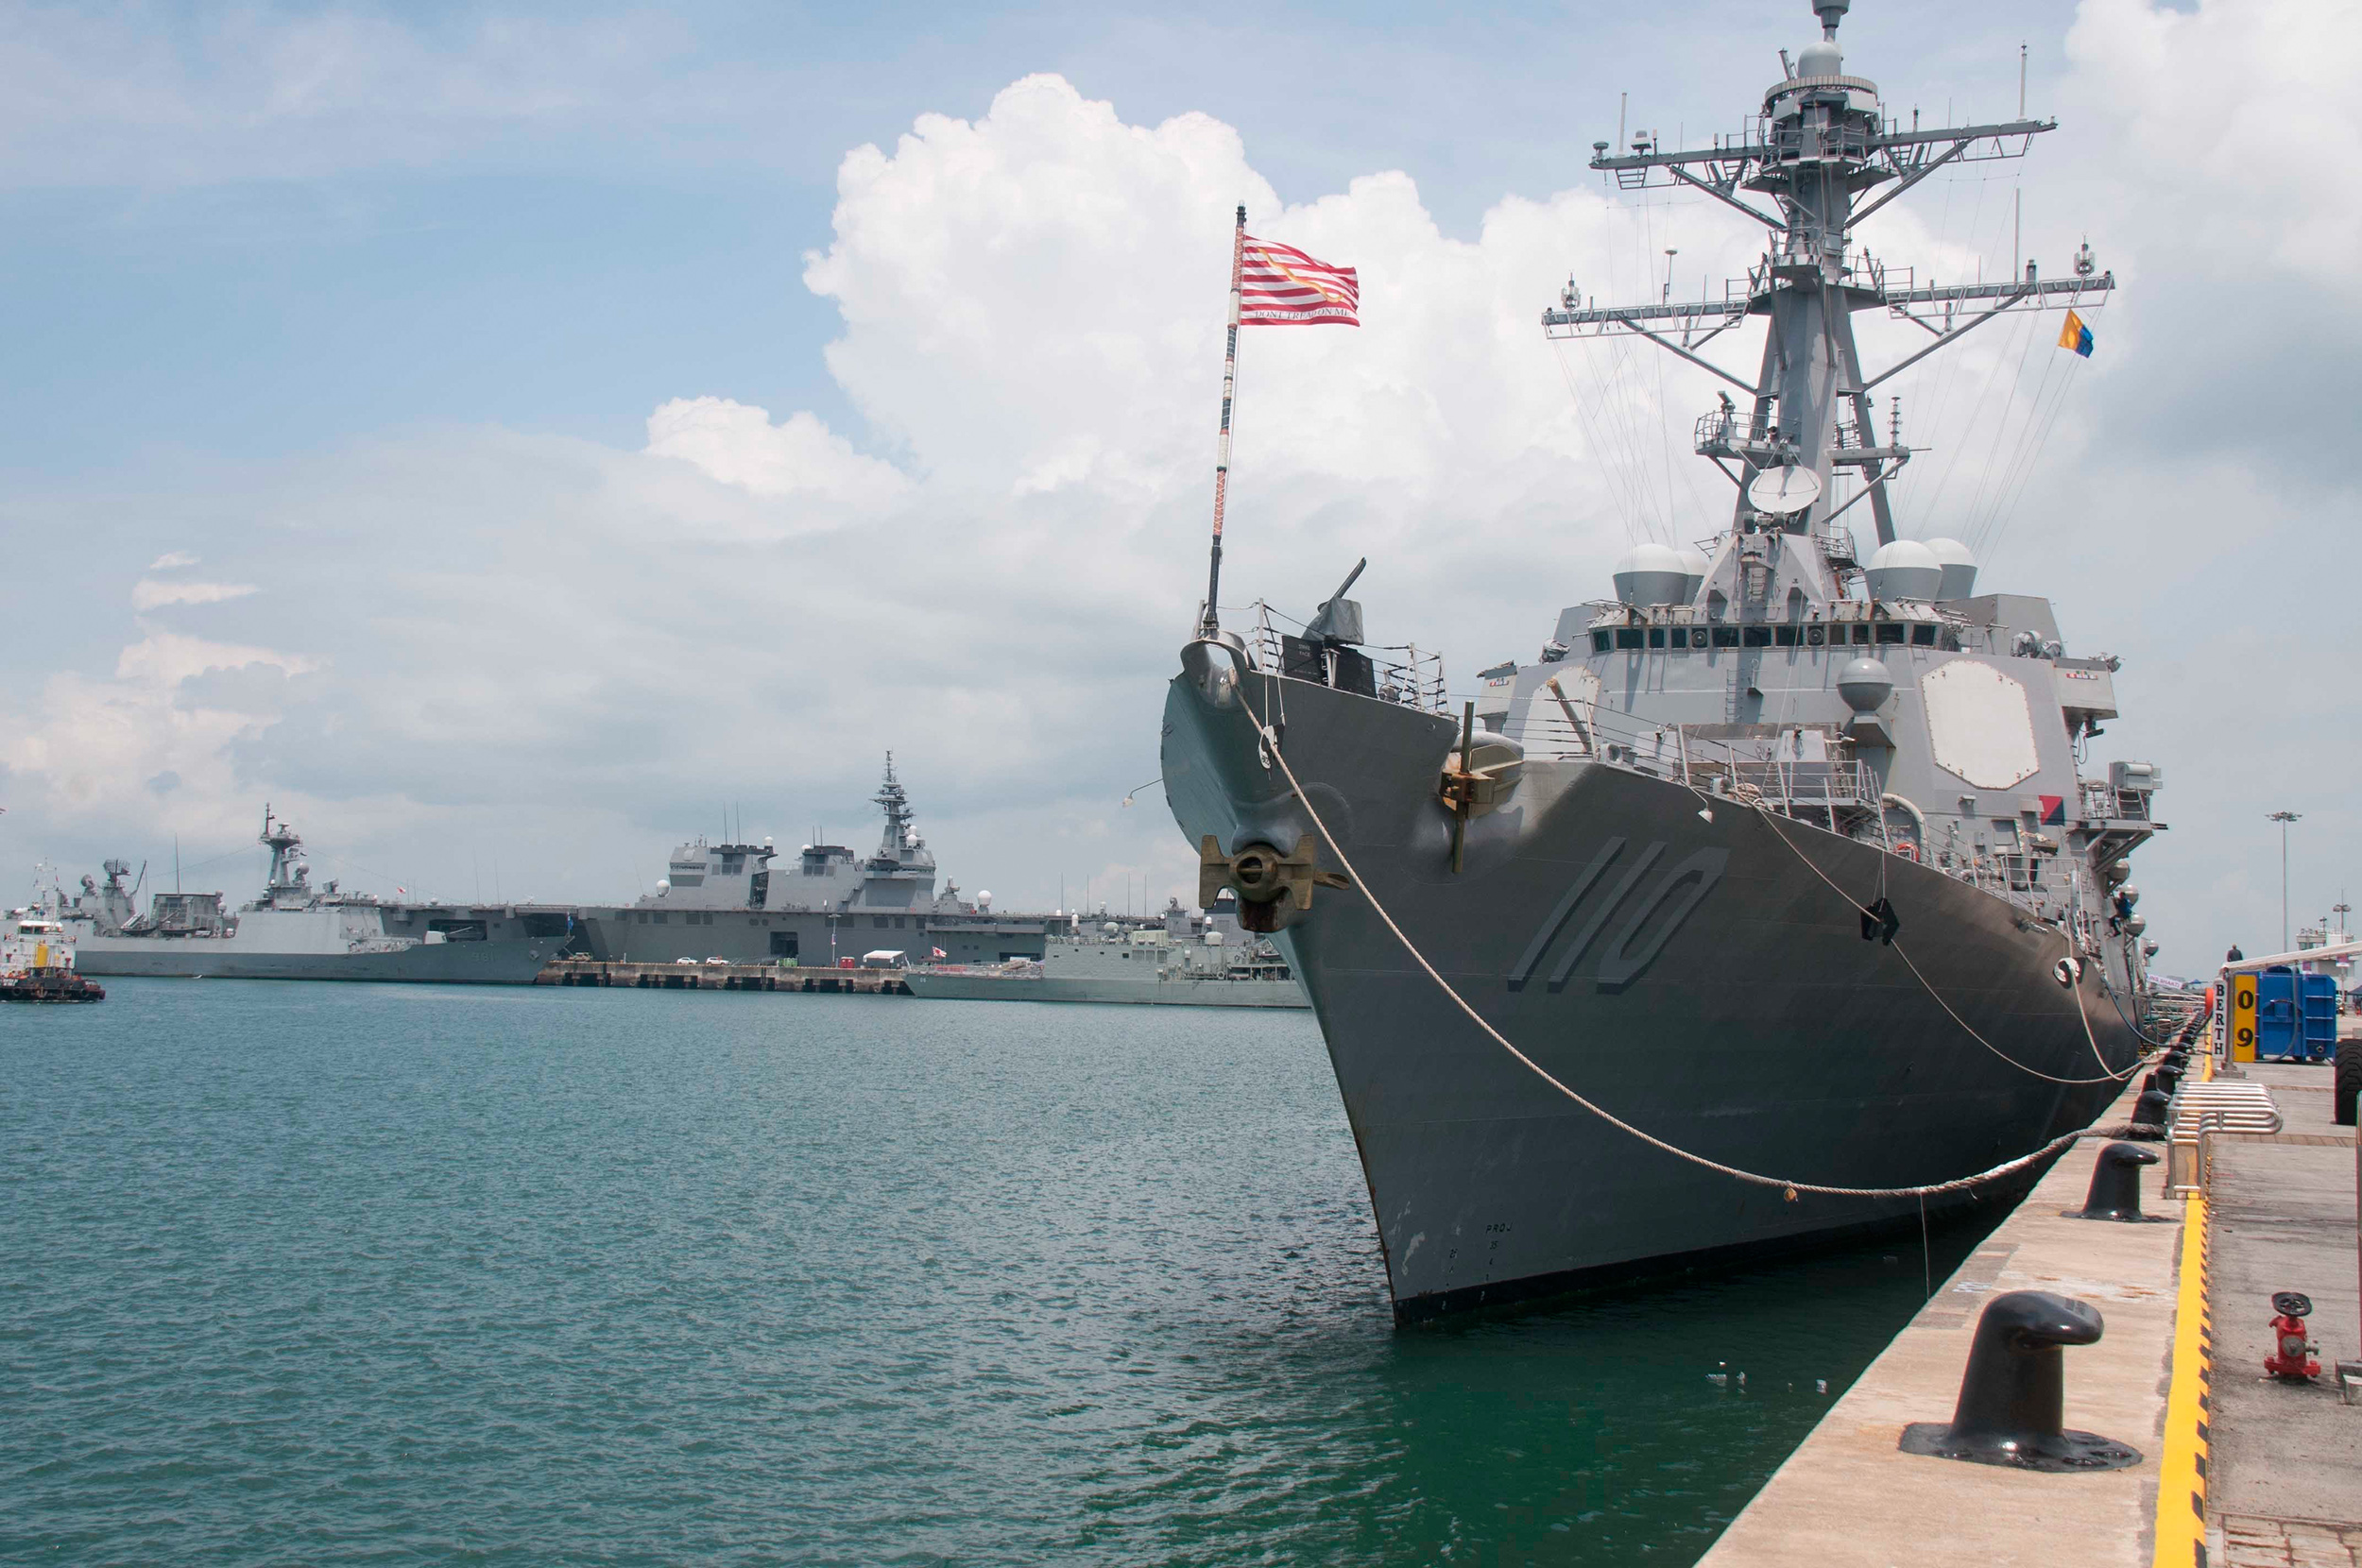 U S  Navy CNO, Ship and Aircraft Join International Maritime Defence